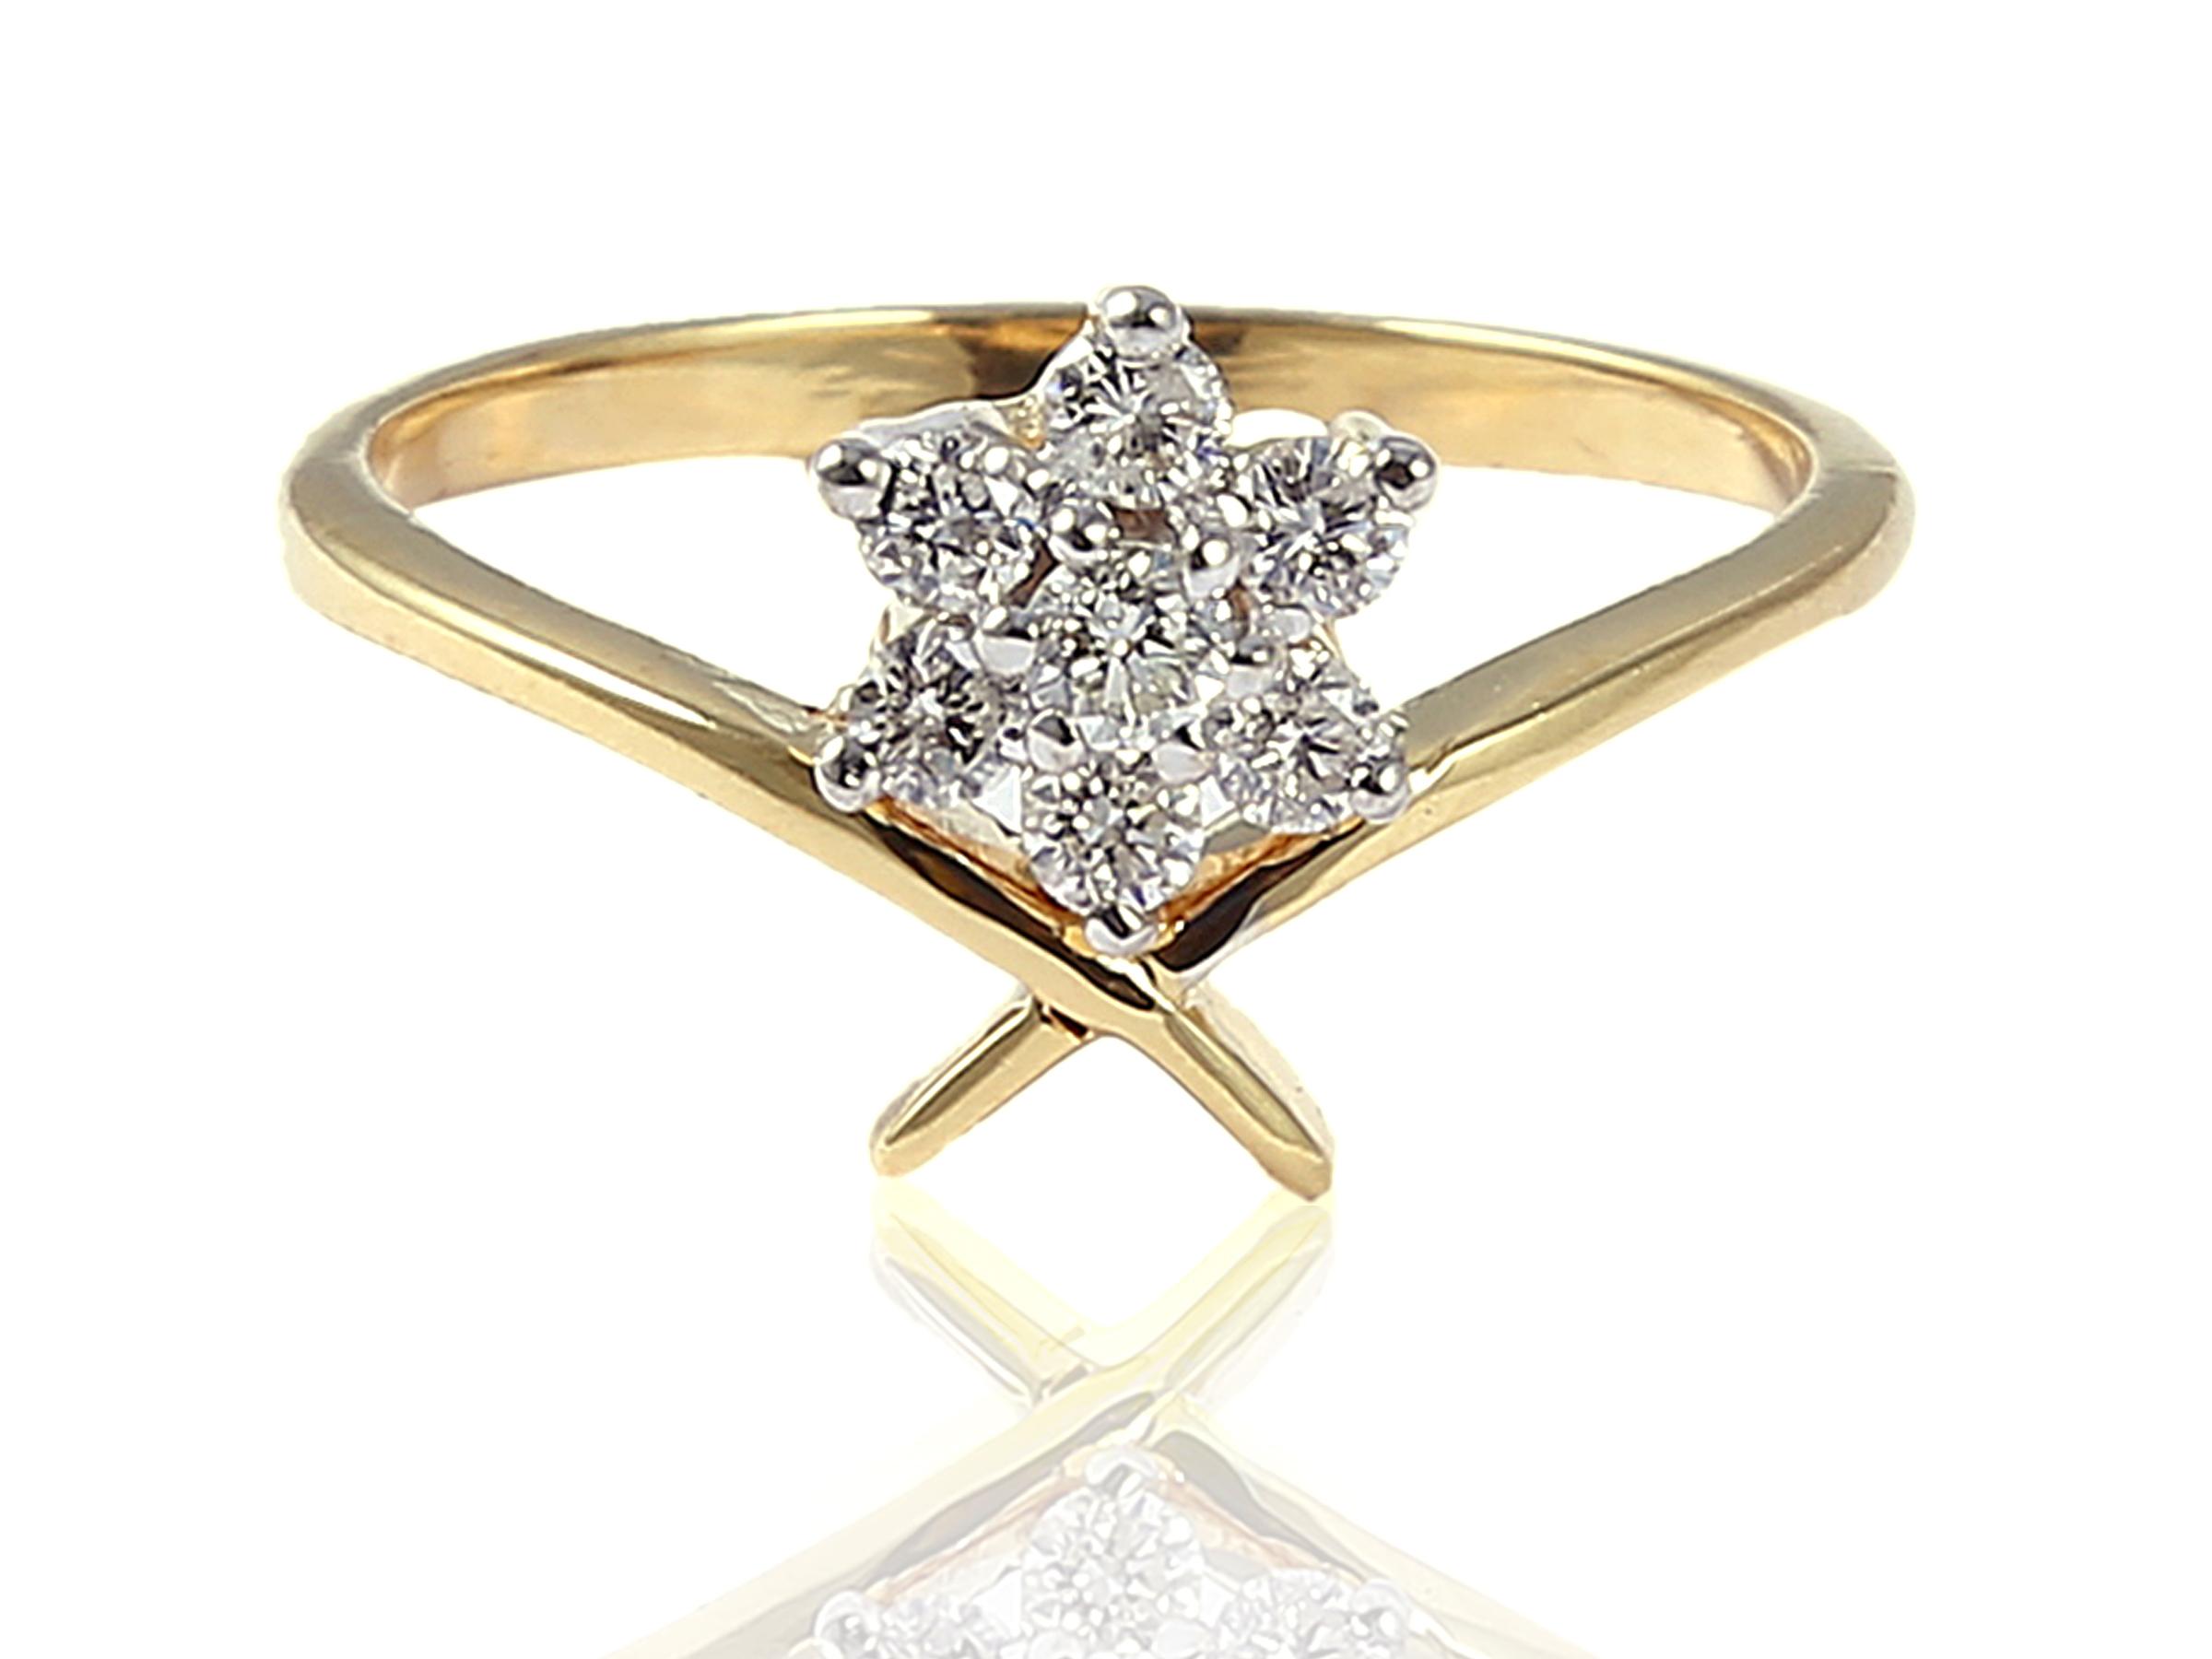 Diamond Ring In Solid BIS Hallmark 18KT Yellow Gold  LR 473 F